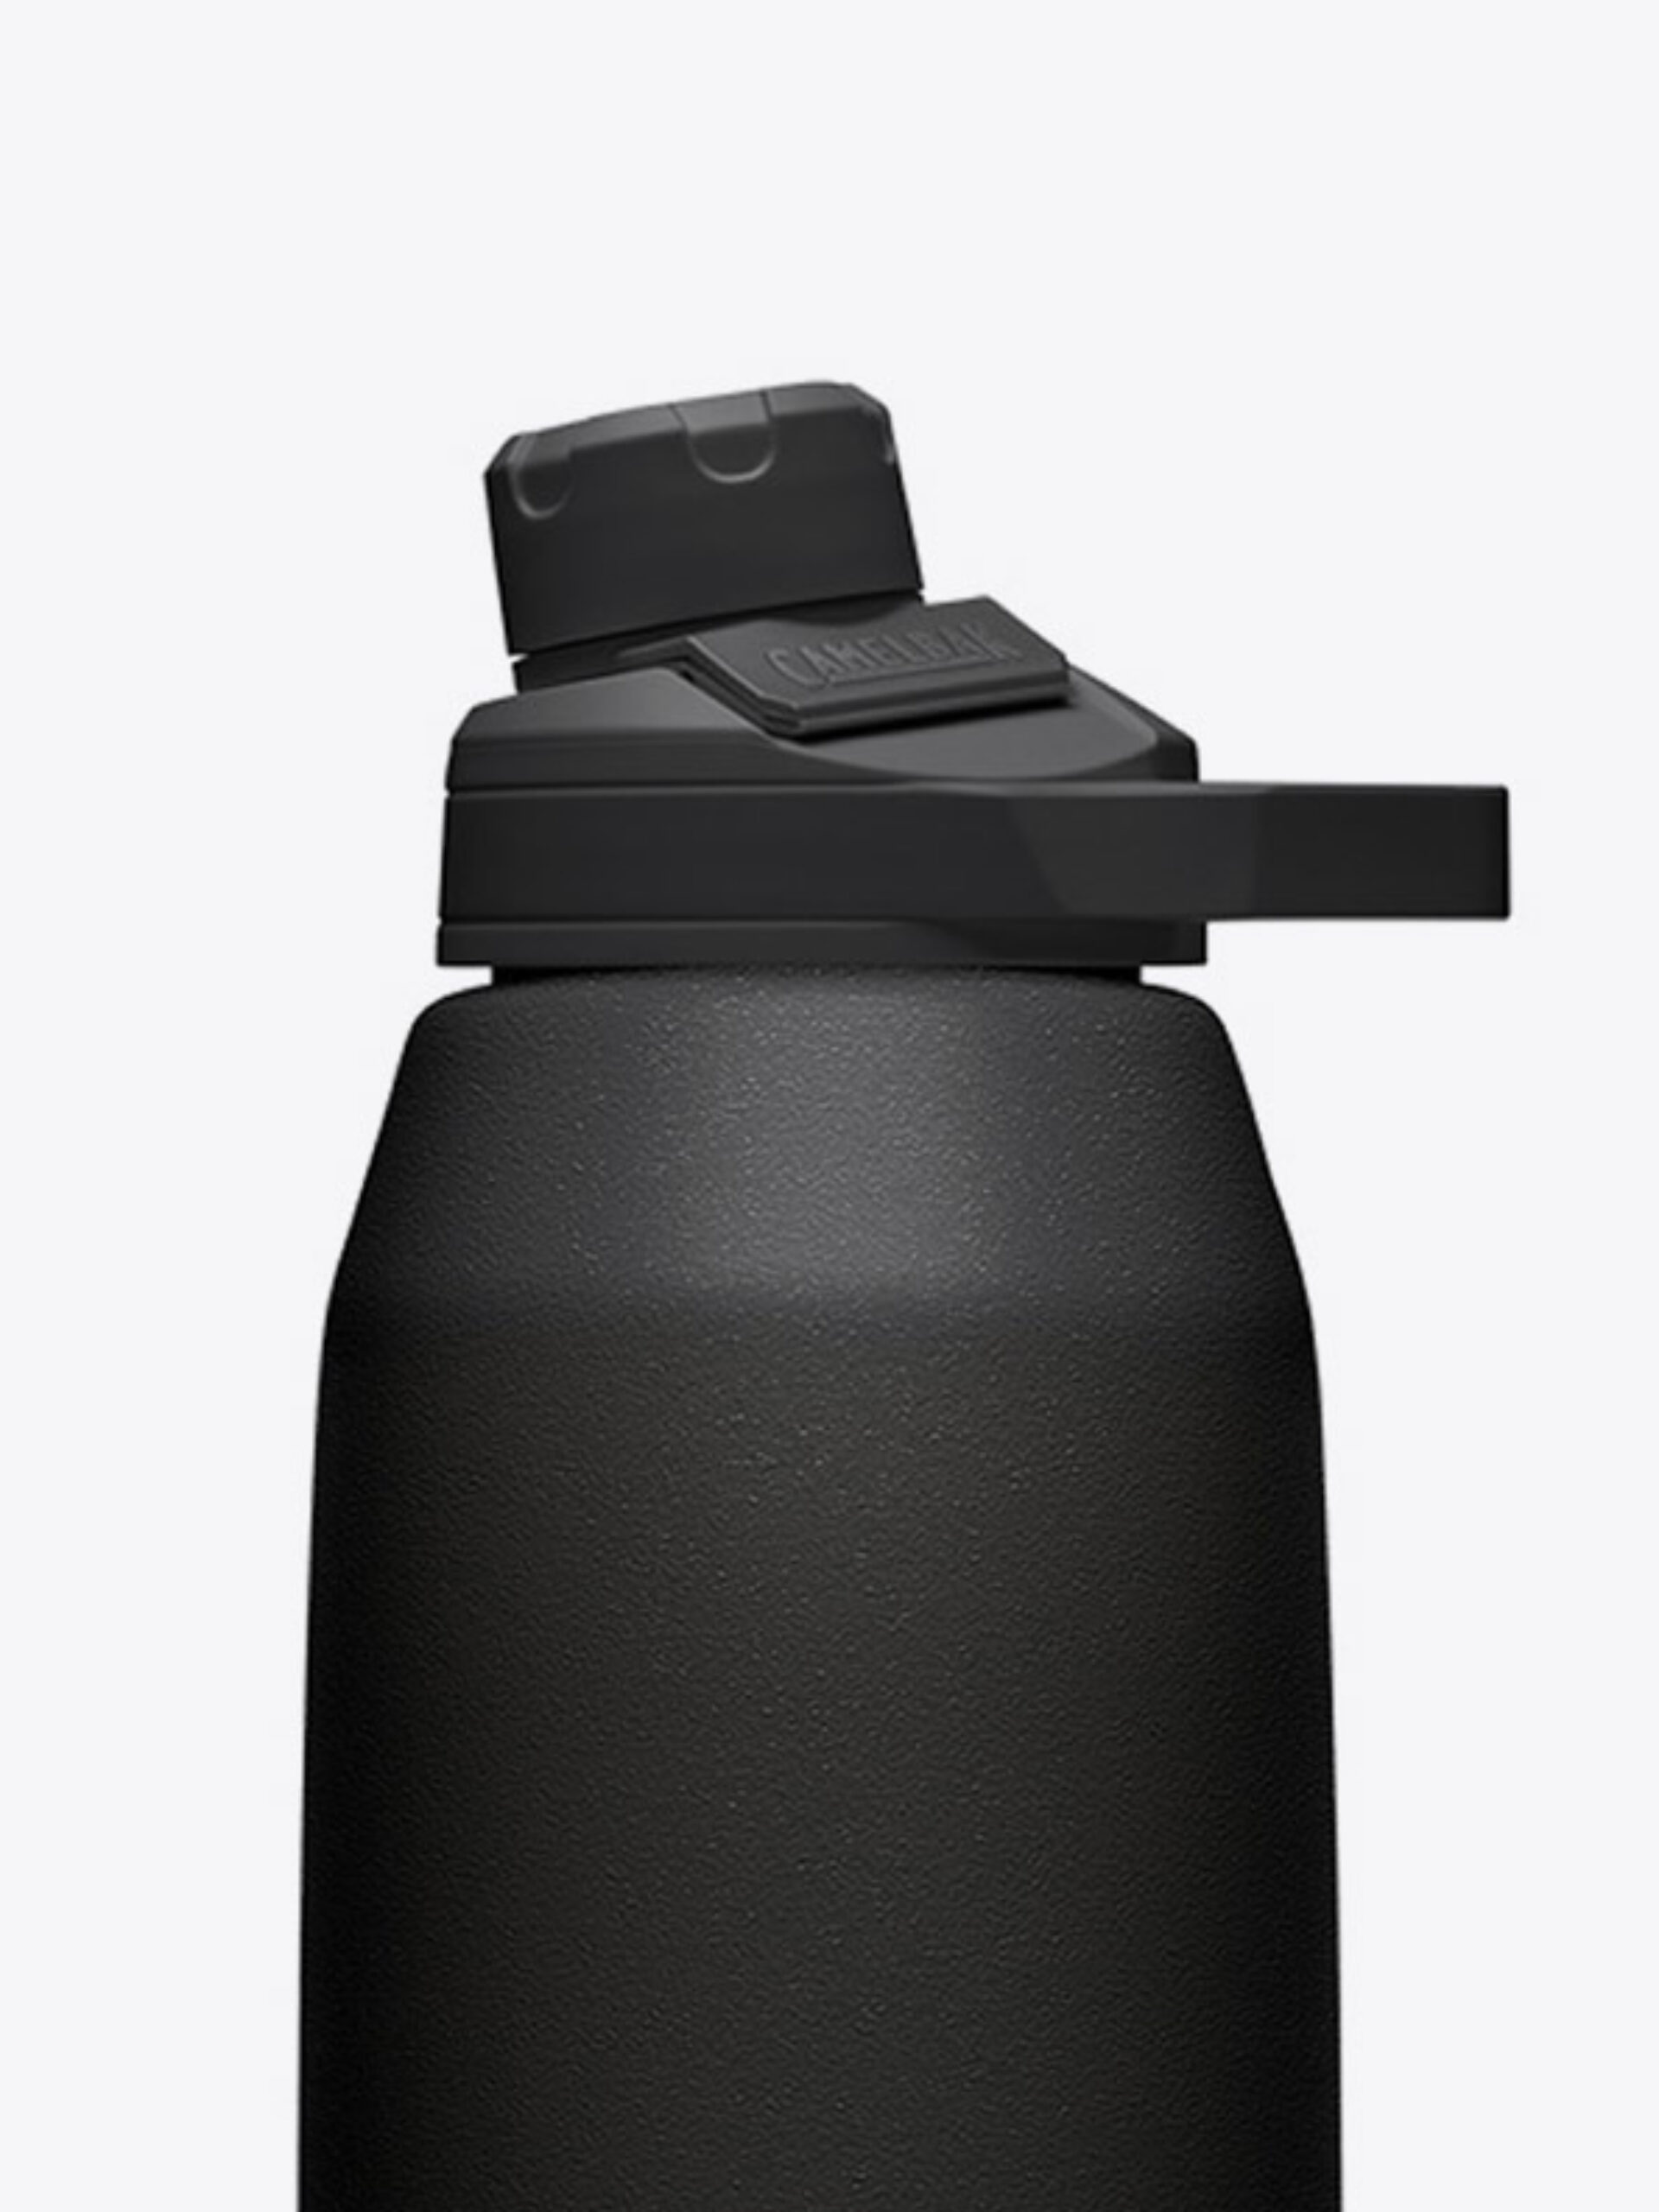 Thermosflasche Camelbak Mit Logo Graviert CloseUp